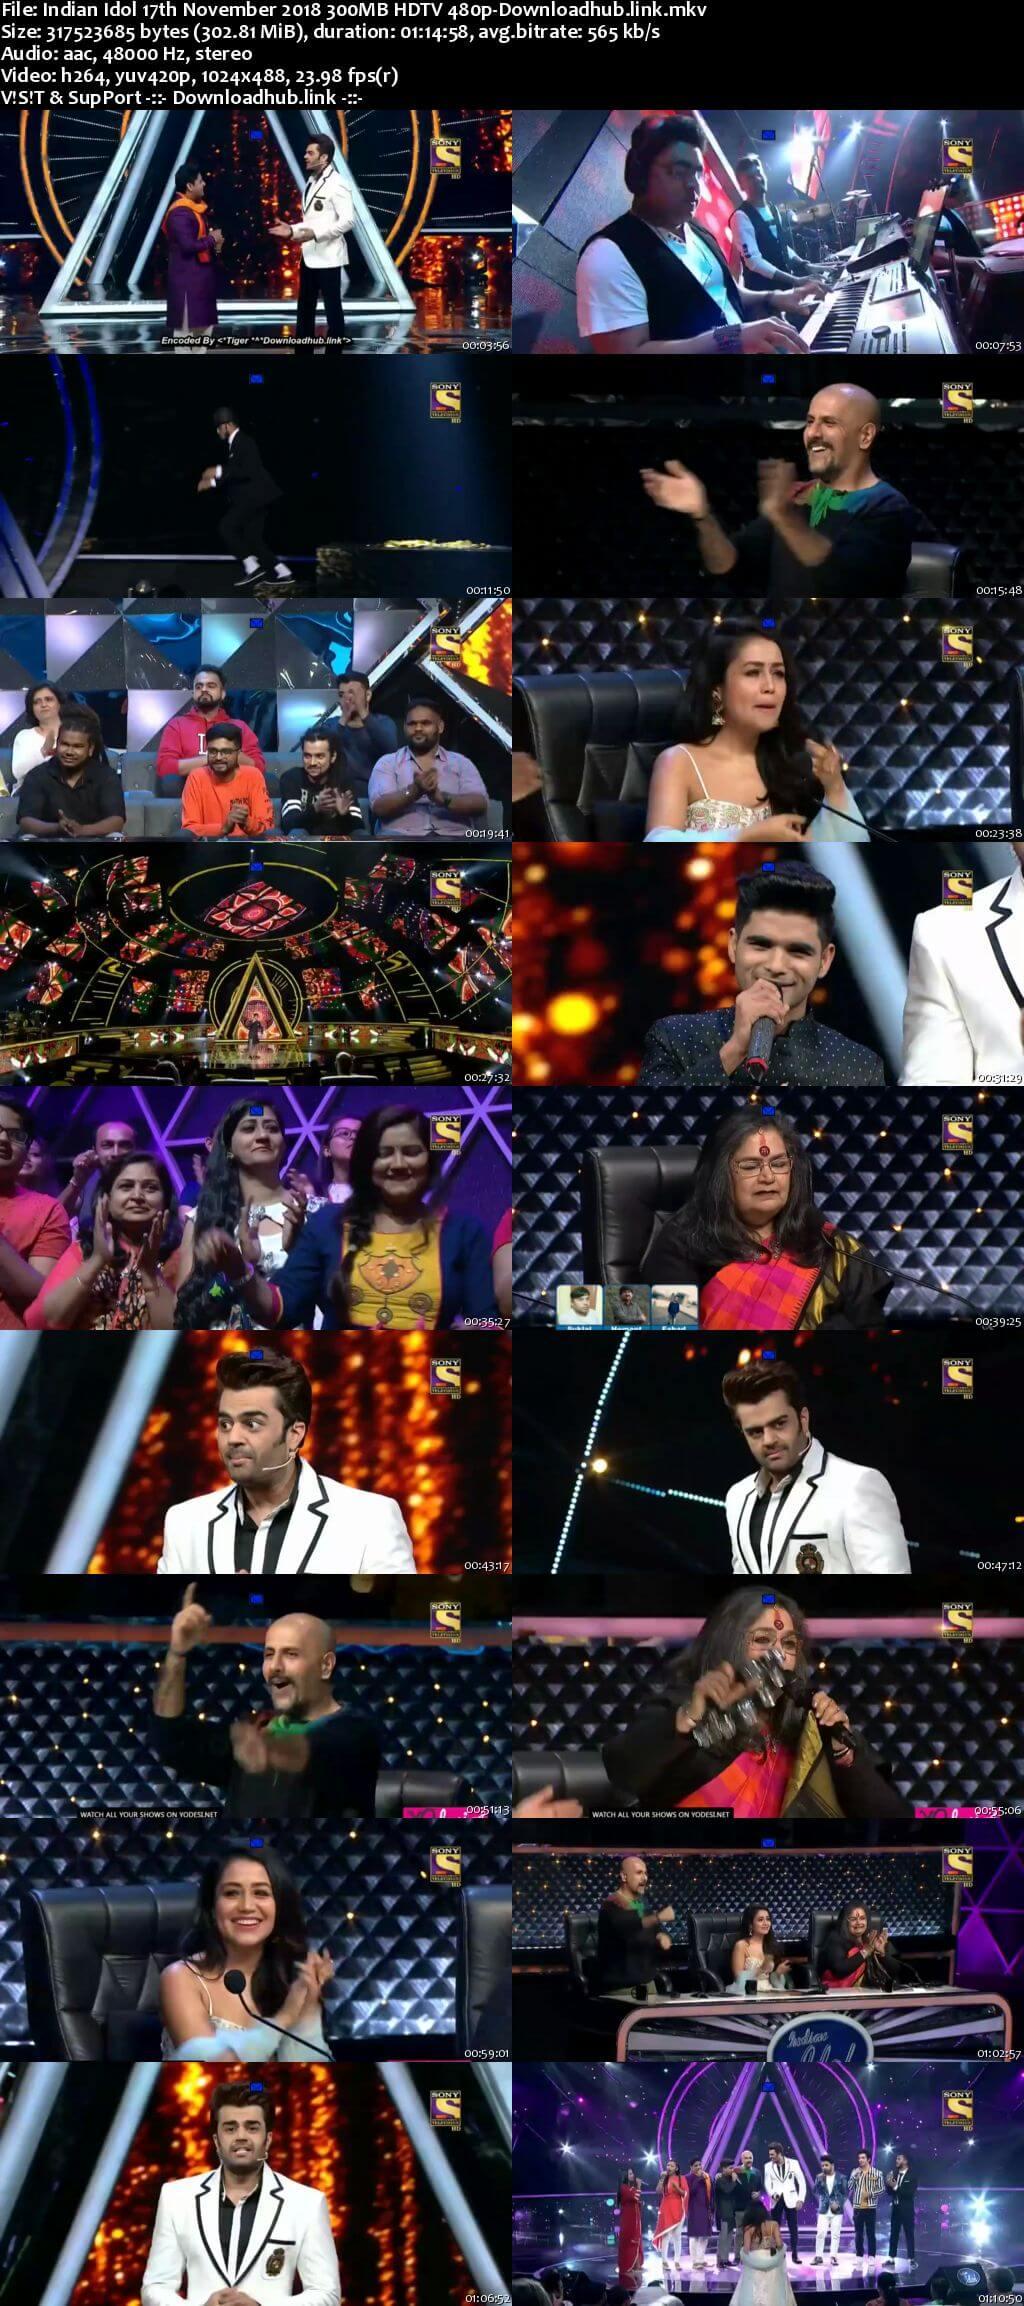 Indian Idol 17 November 2018 Episode 39 HDTV 480p